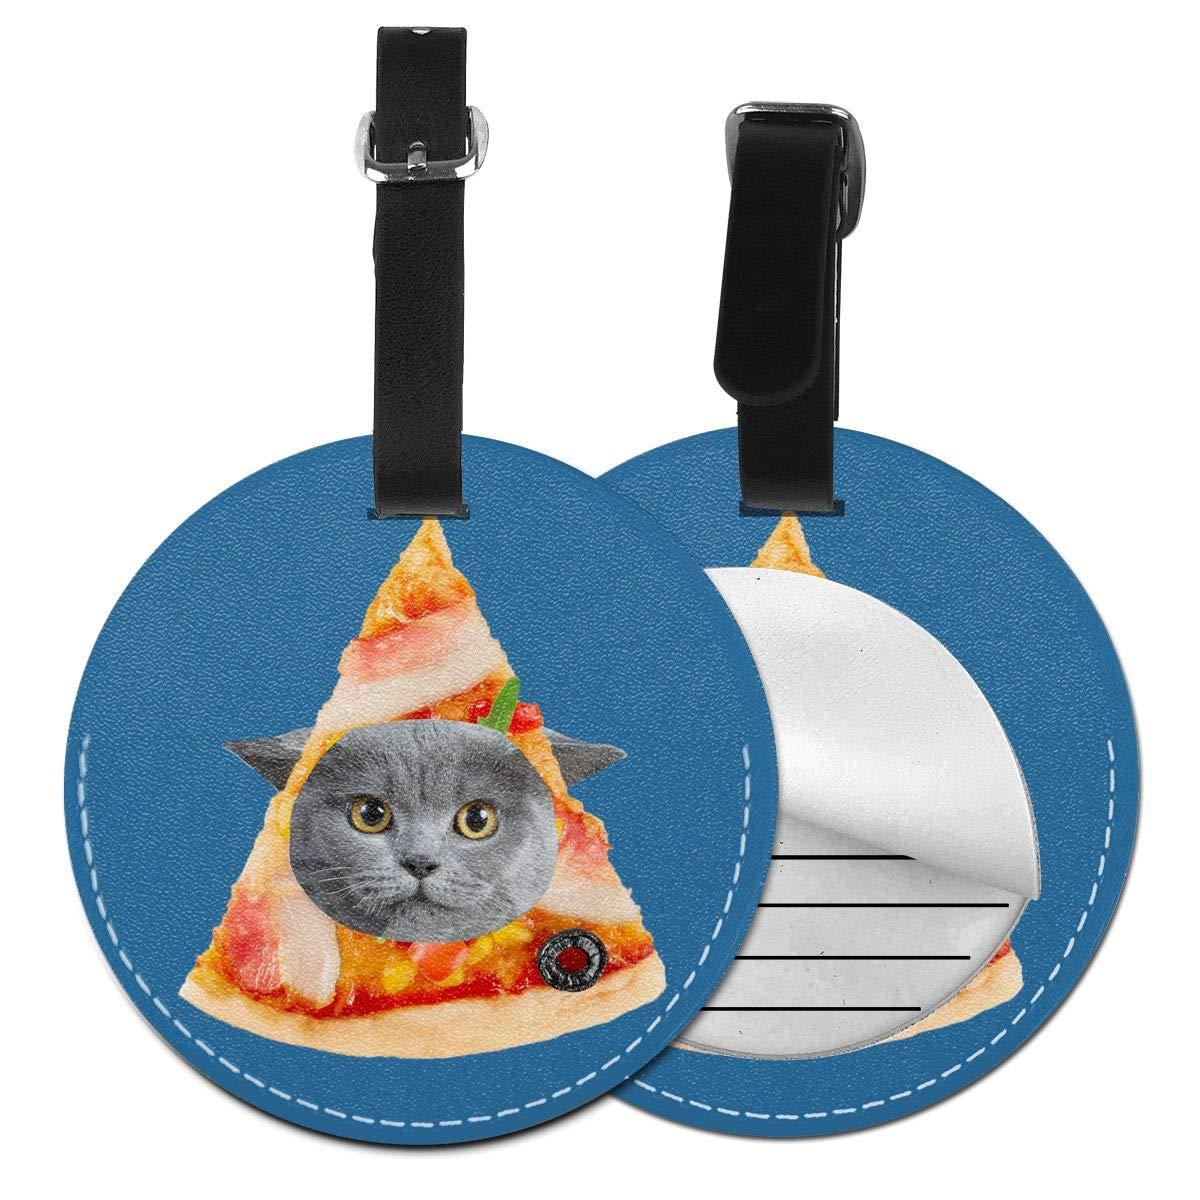 1pcs,2pcs,4pcs Terrible Fat Kitty Fish Pizza Cat Pet Pu Leather Double Sides Print Round Luggage Tag Mutilple Packs